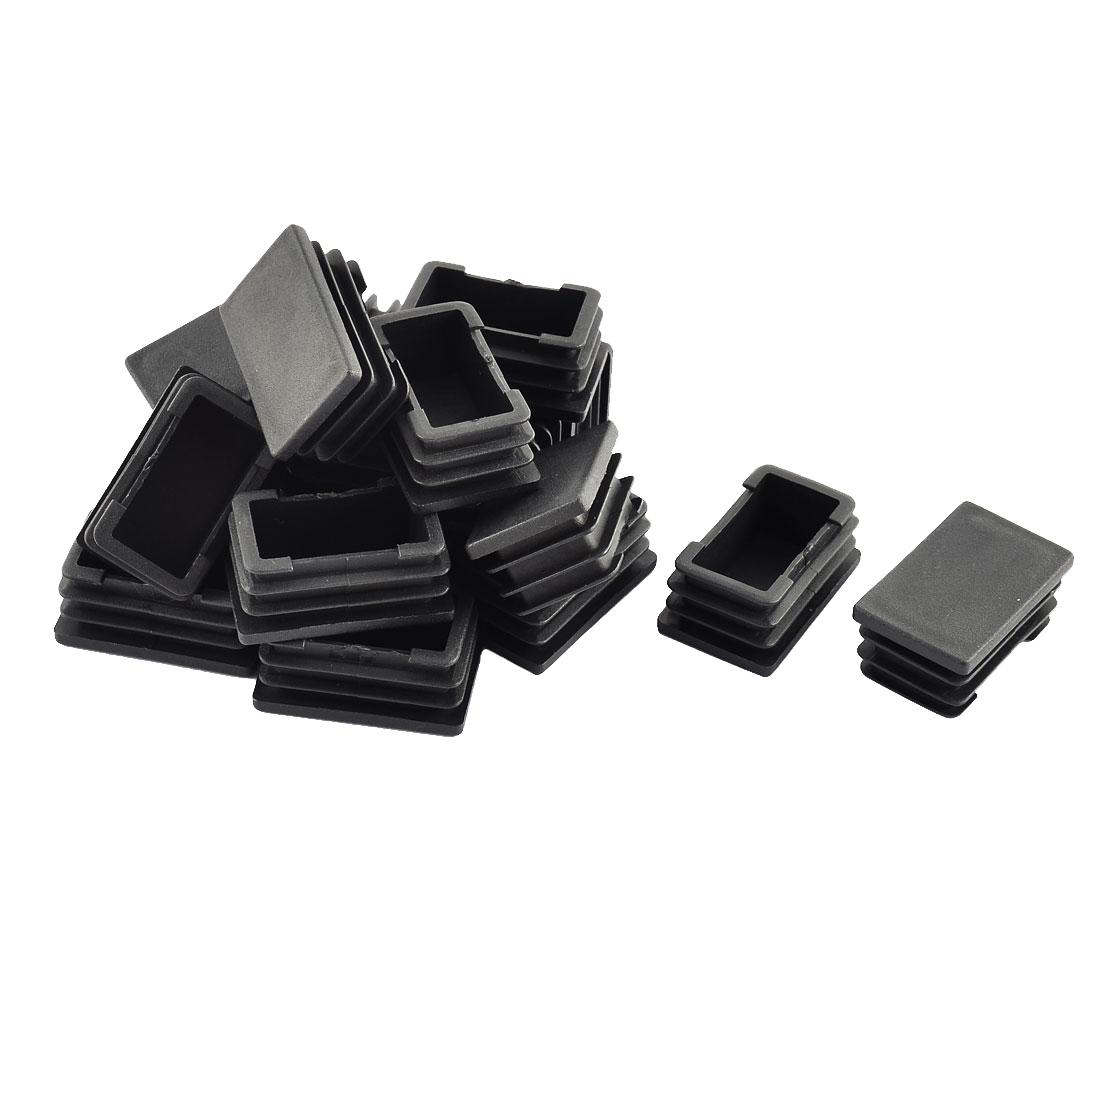 Home Floor Protect Table Chair Leg Tube Insert Blanking Black 39 x 23mm 20pcs